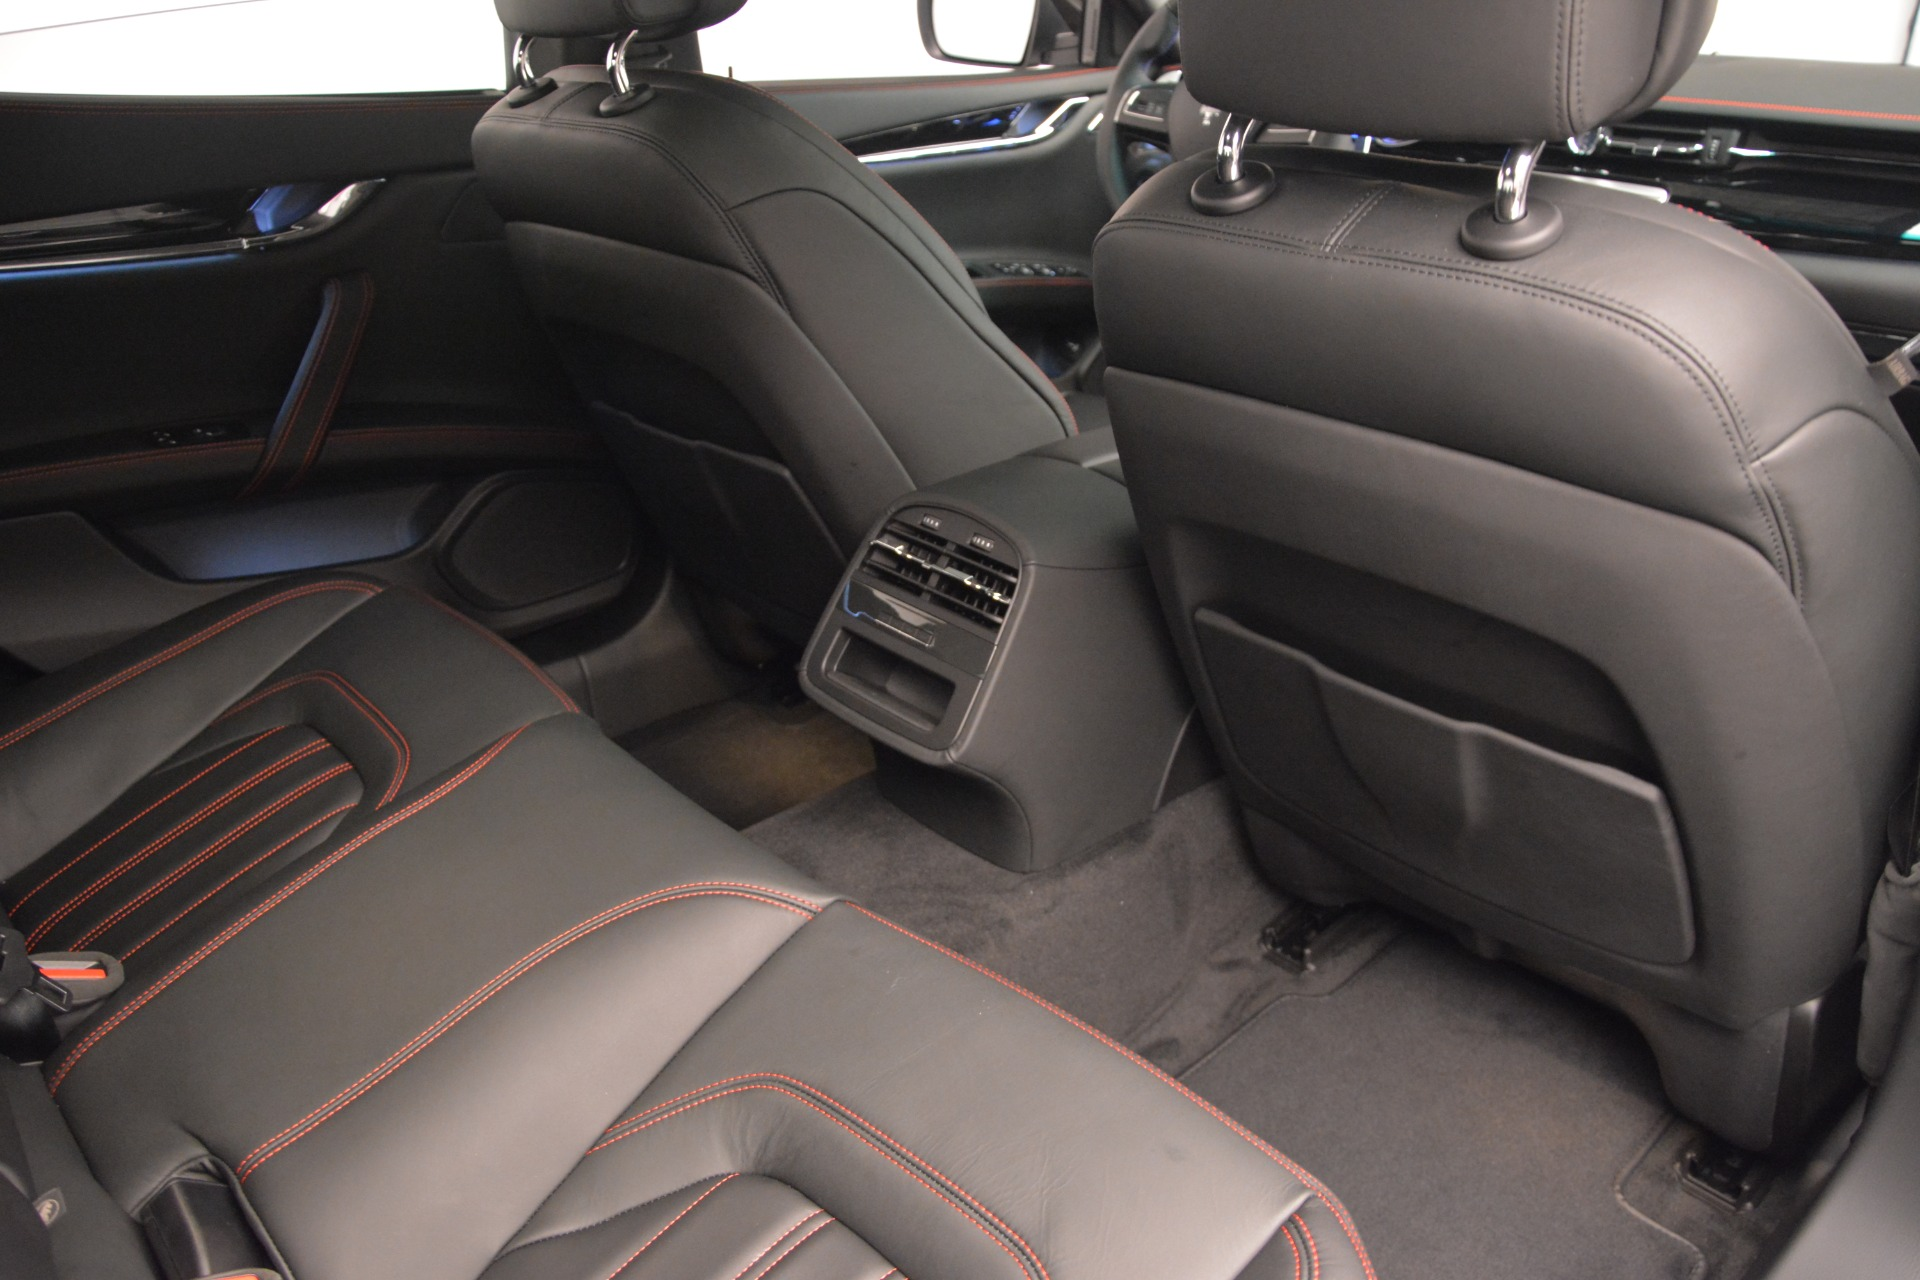 Used 2015 Maserati Quattroporte GTS For Sale In Westport, CT 2993_p22